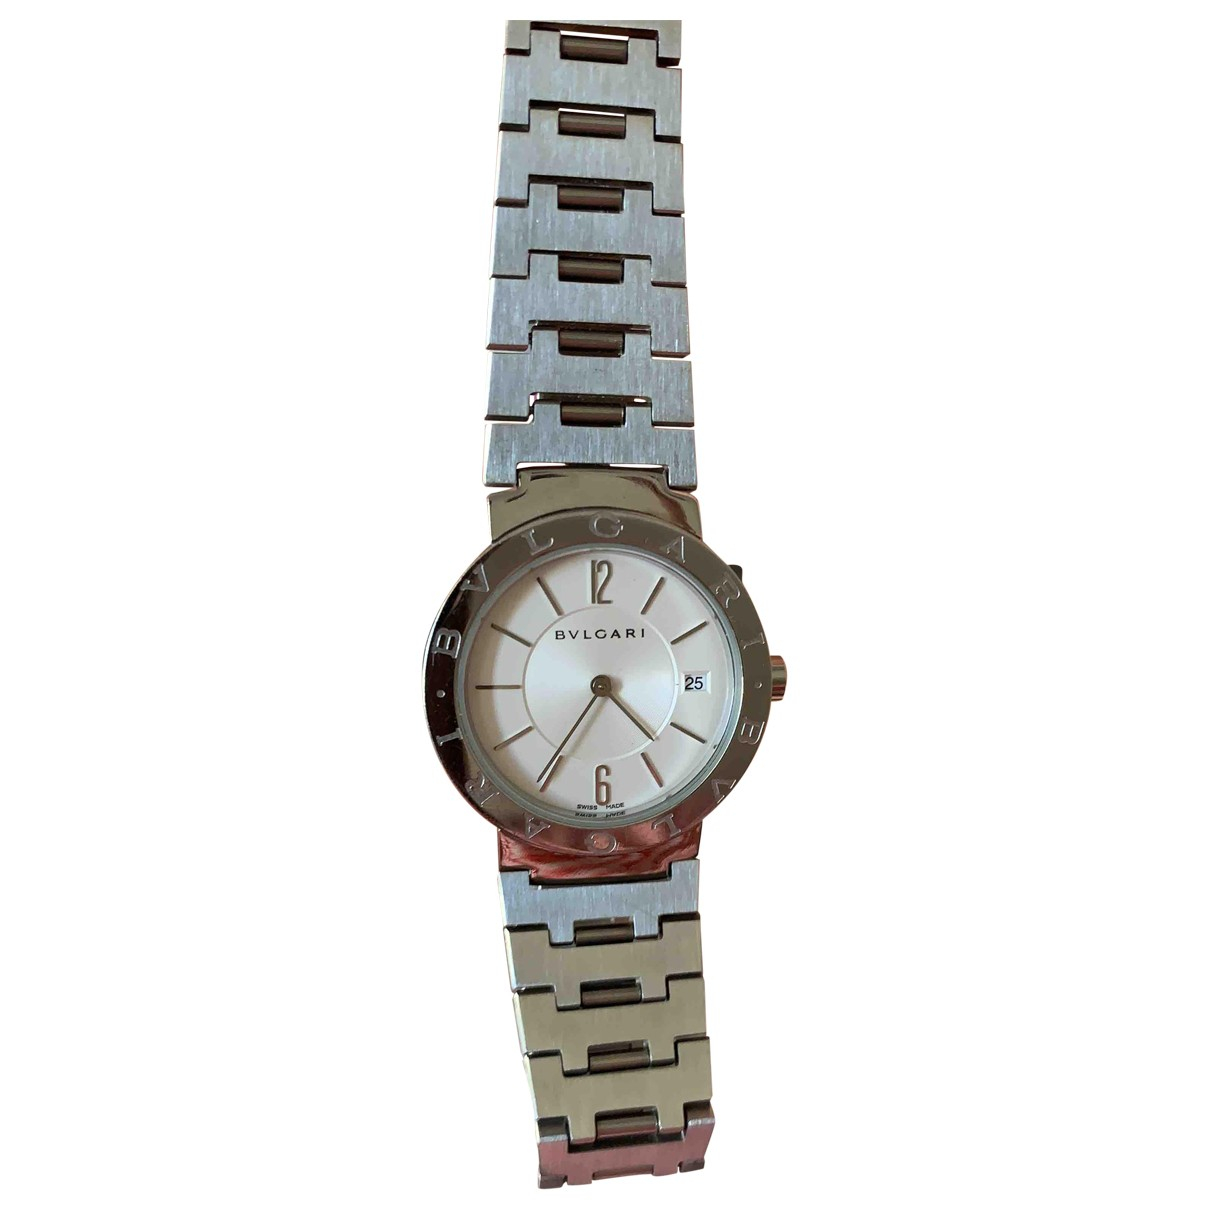 Bvlgari Bulgari Bulgari Uhr in  Silber Stahl